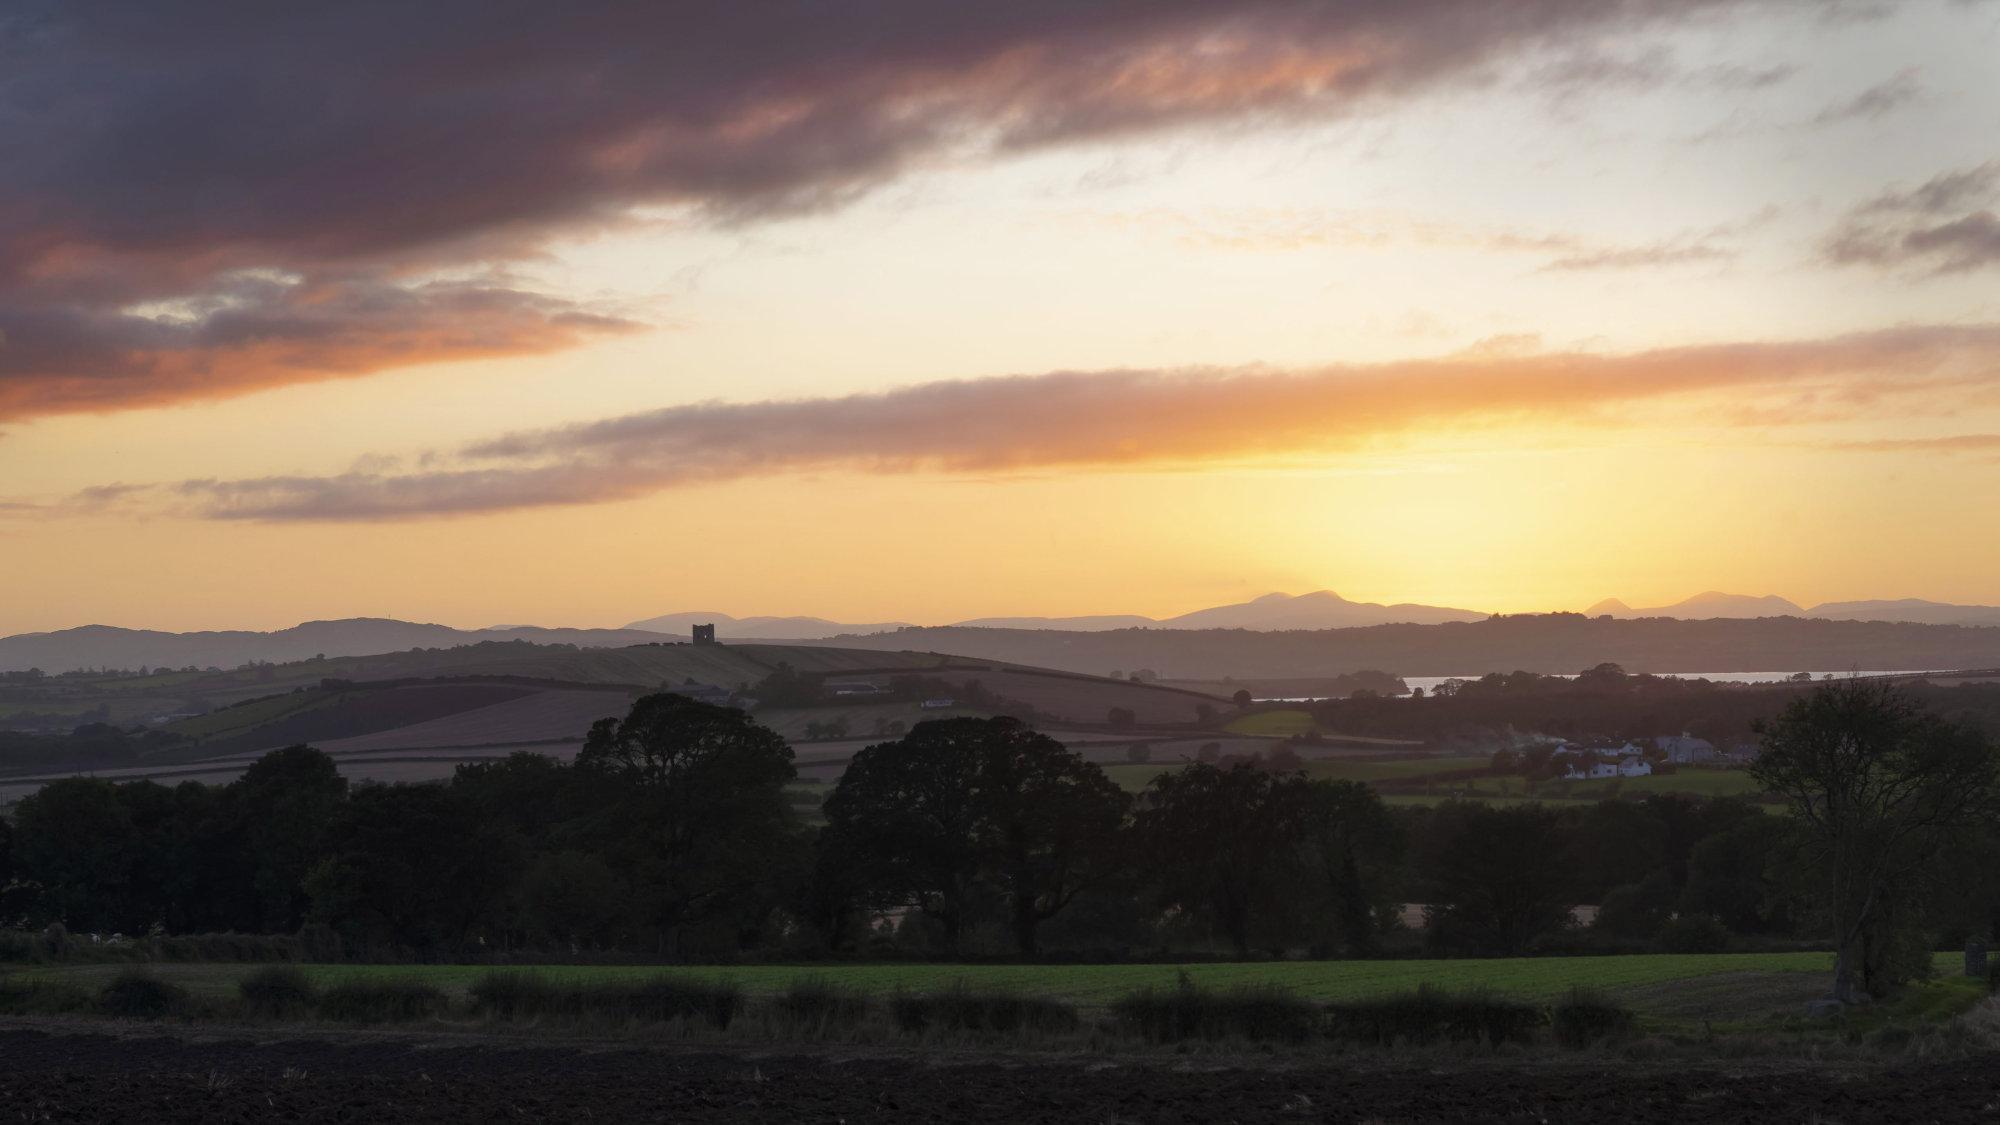 Burt Castle at sunset